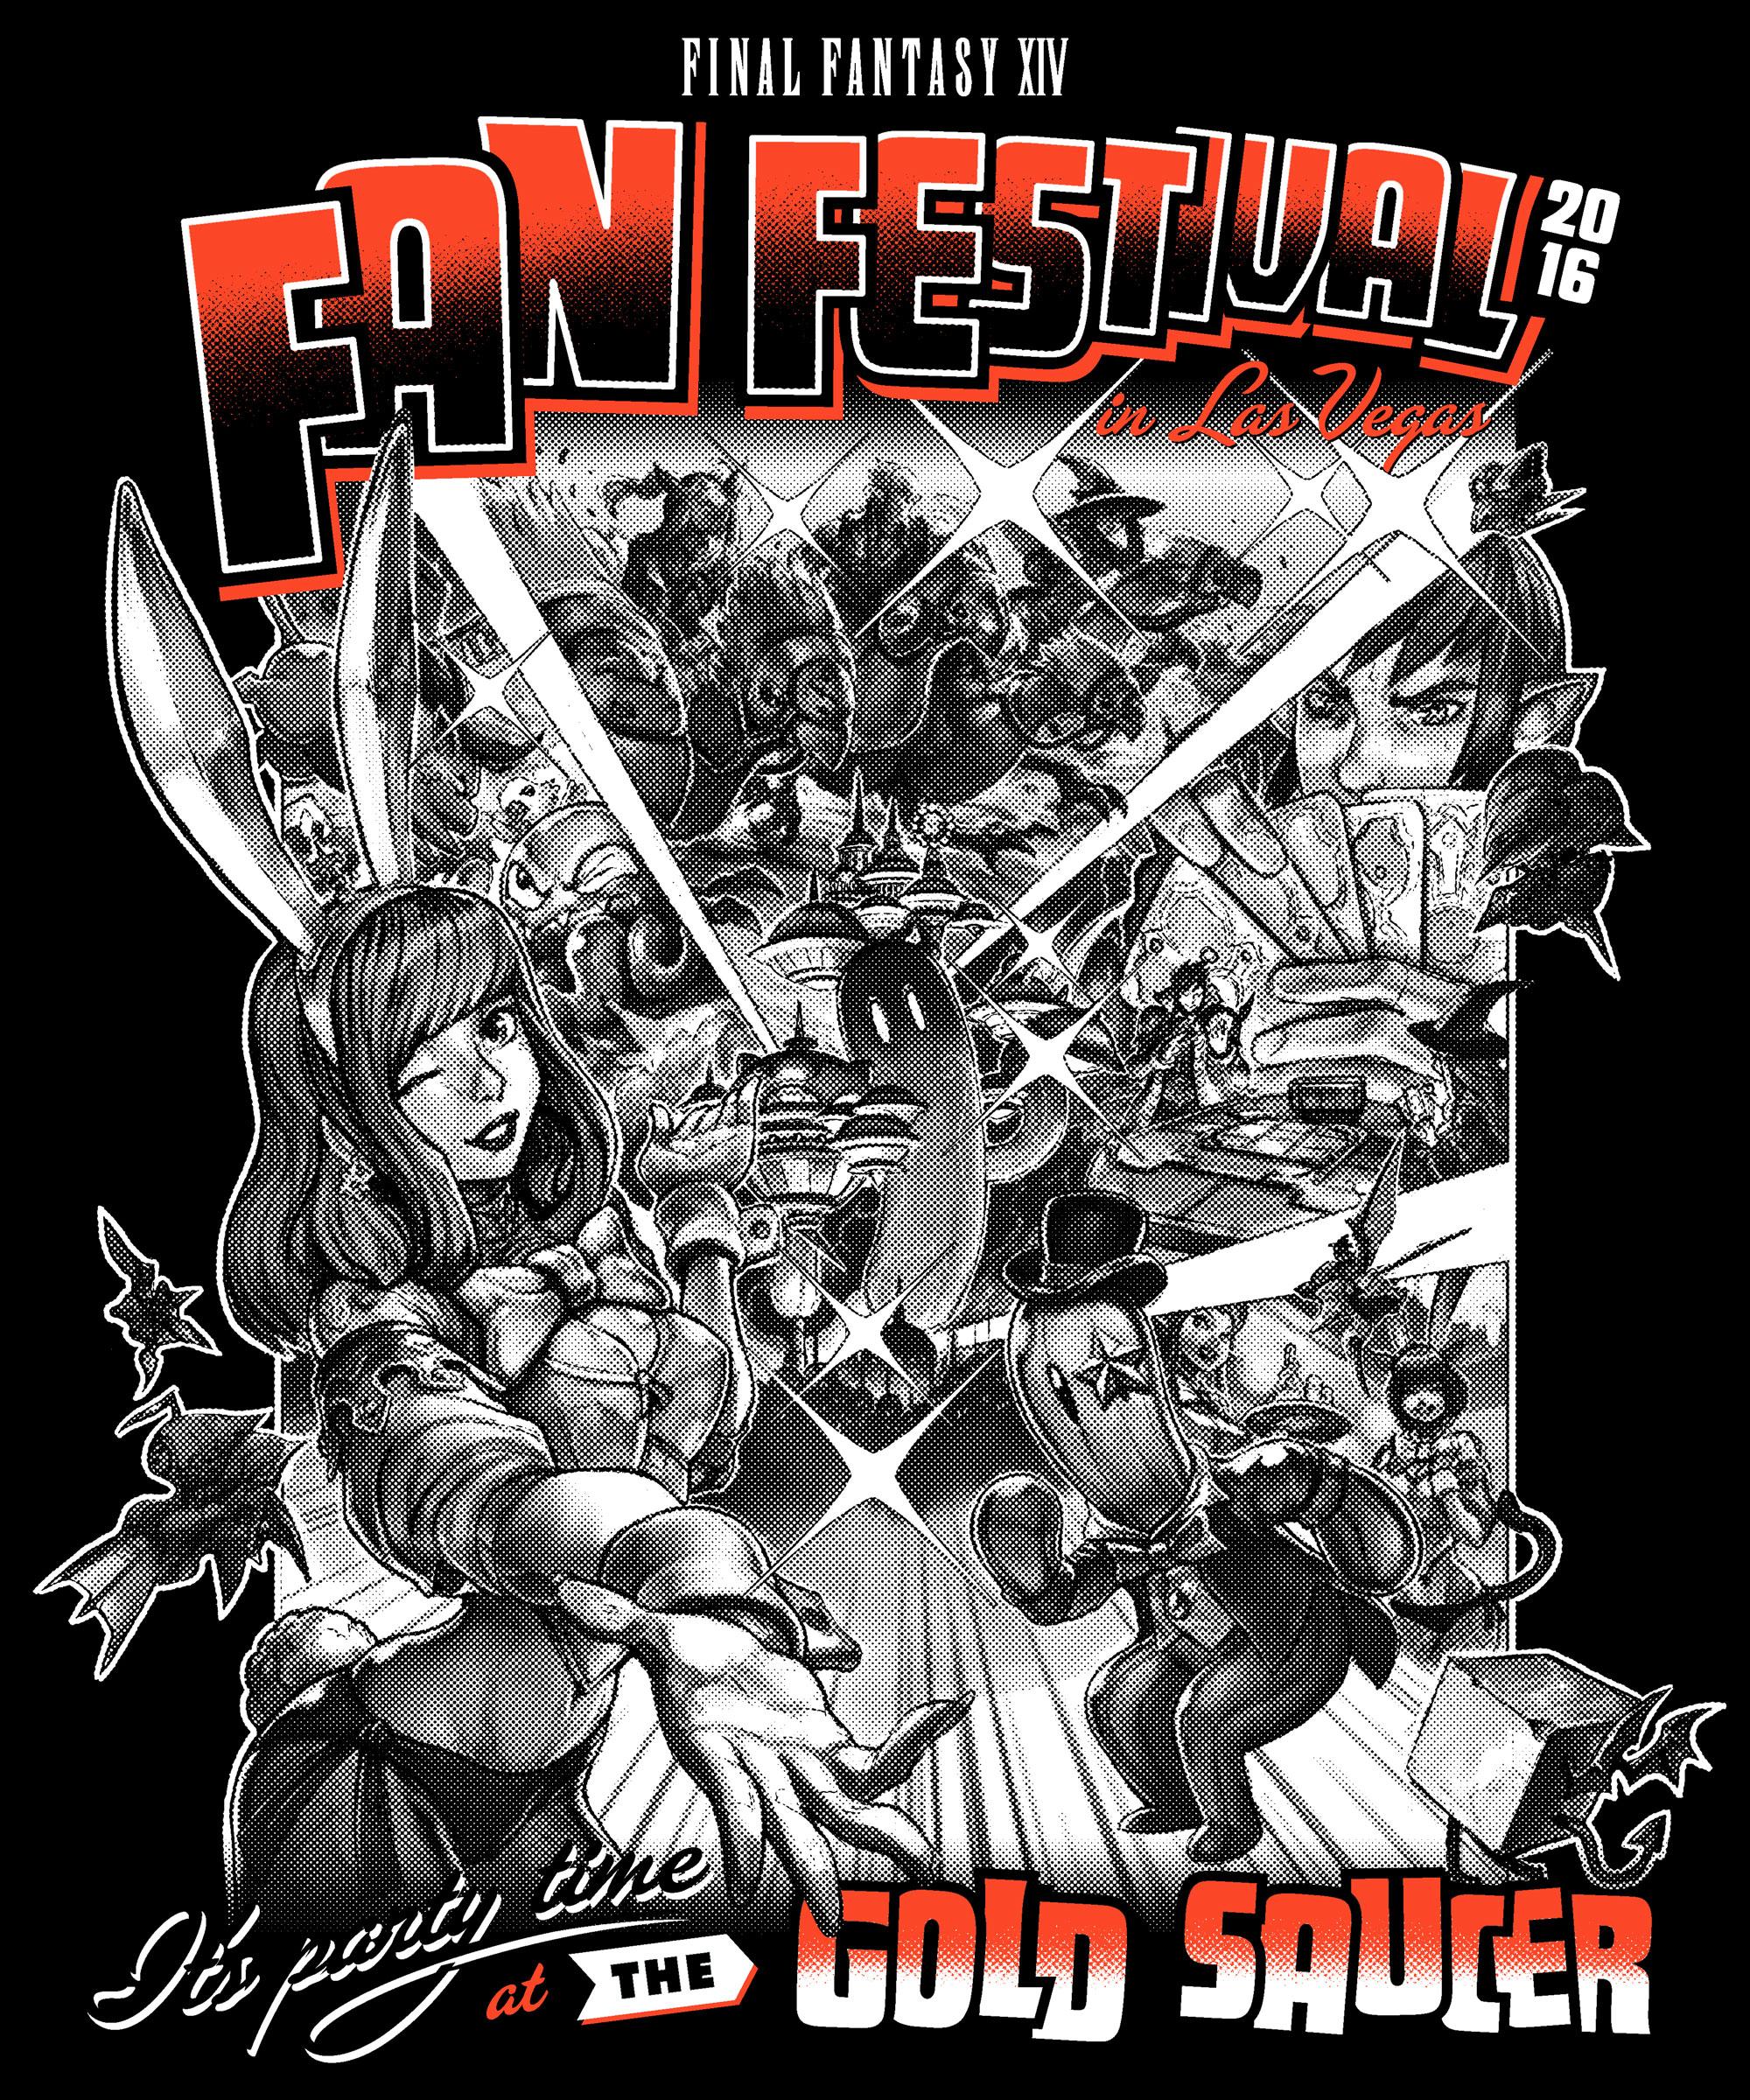 Copy of Final Fantasy Fan Fest 2016 Gold Saucer shirt